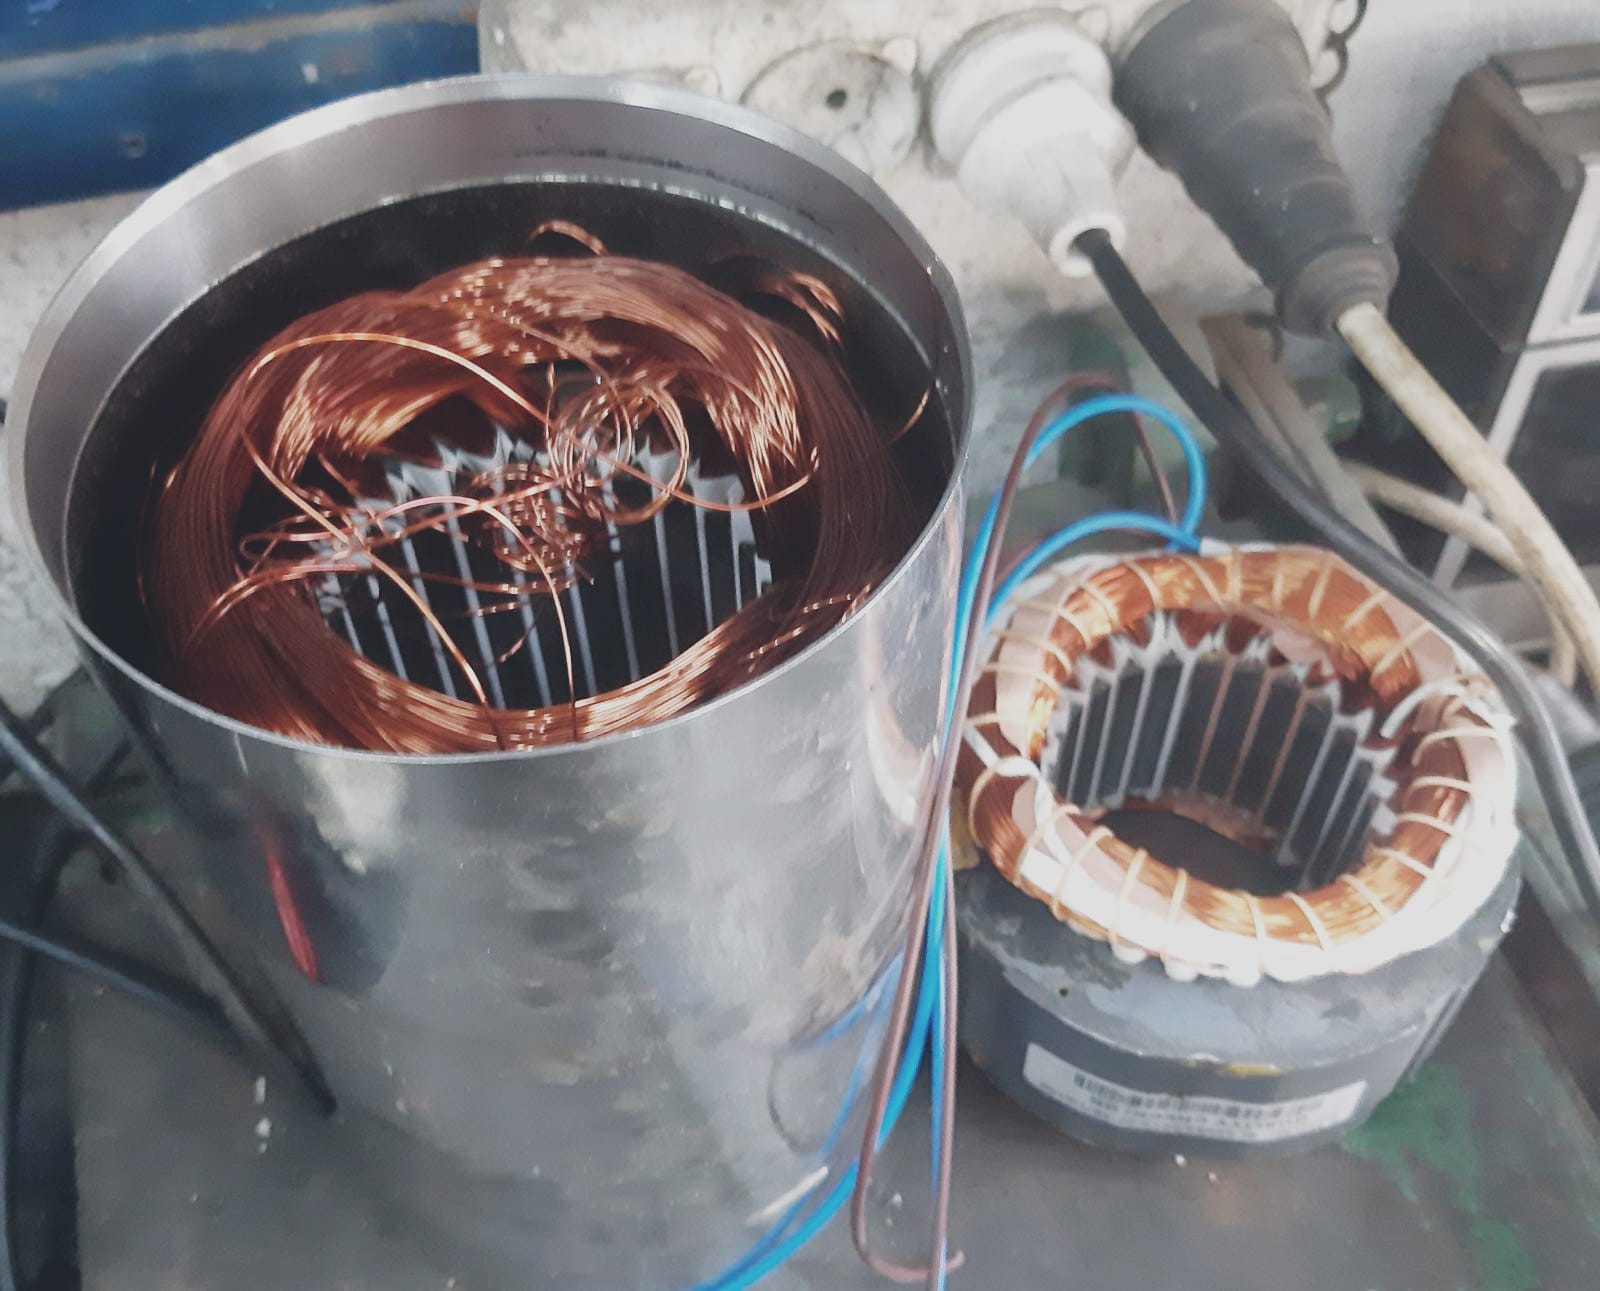 Tayfun Elektrik